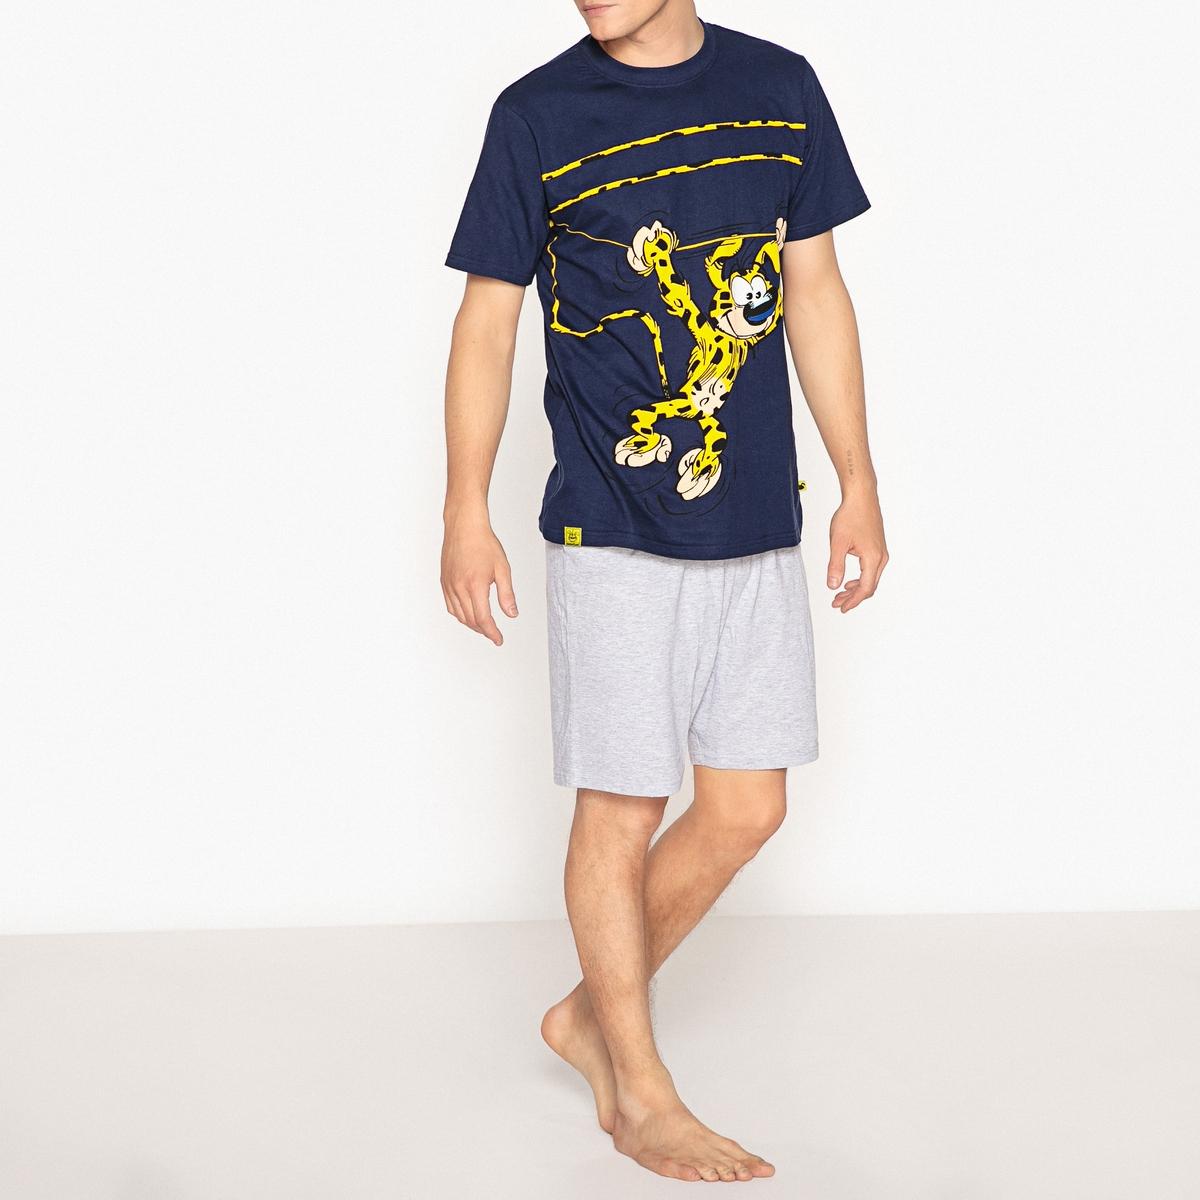 Пижама с шортами из хлопка с рисунком Marsupilami пижама с шортами с рисунком